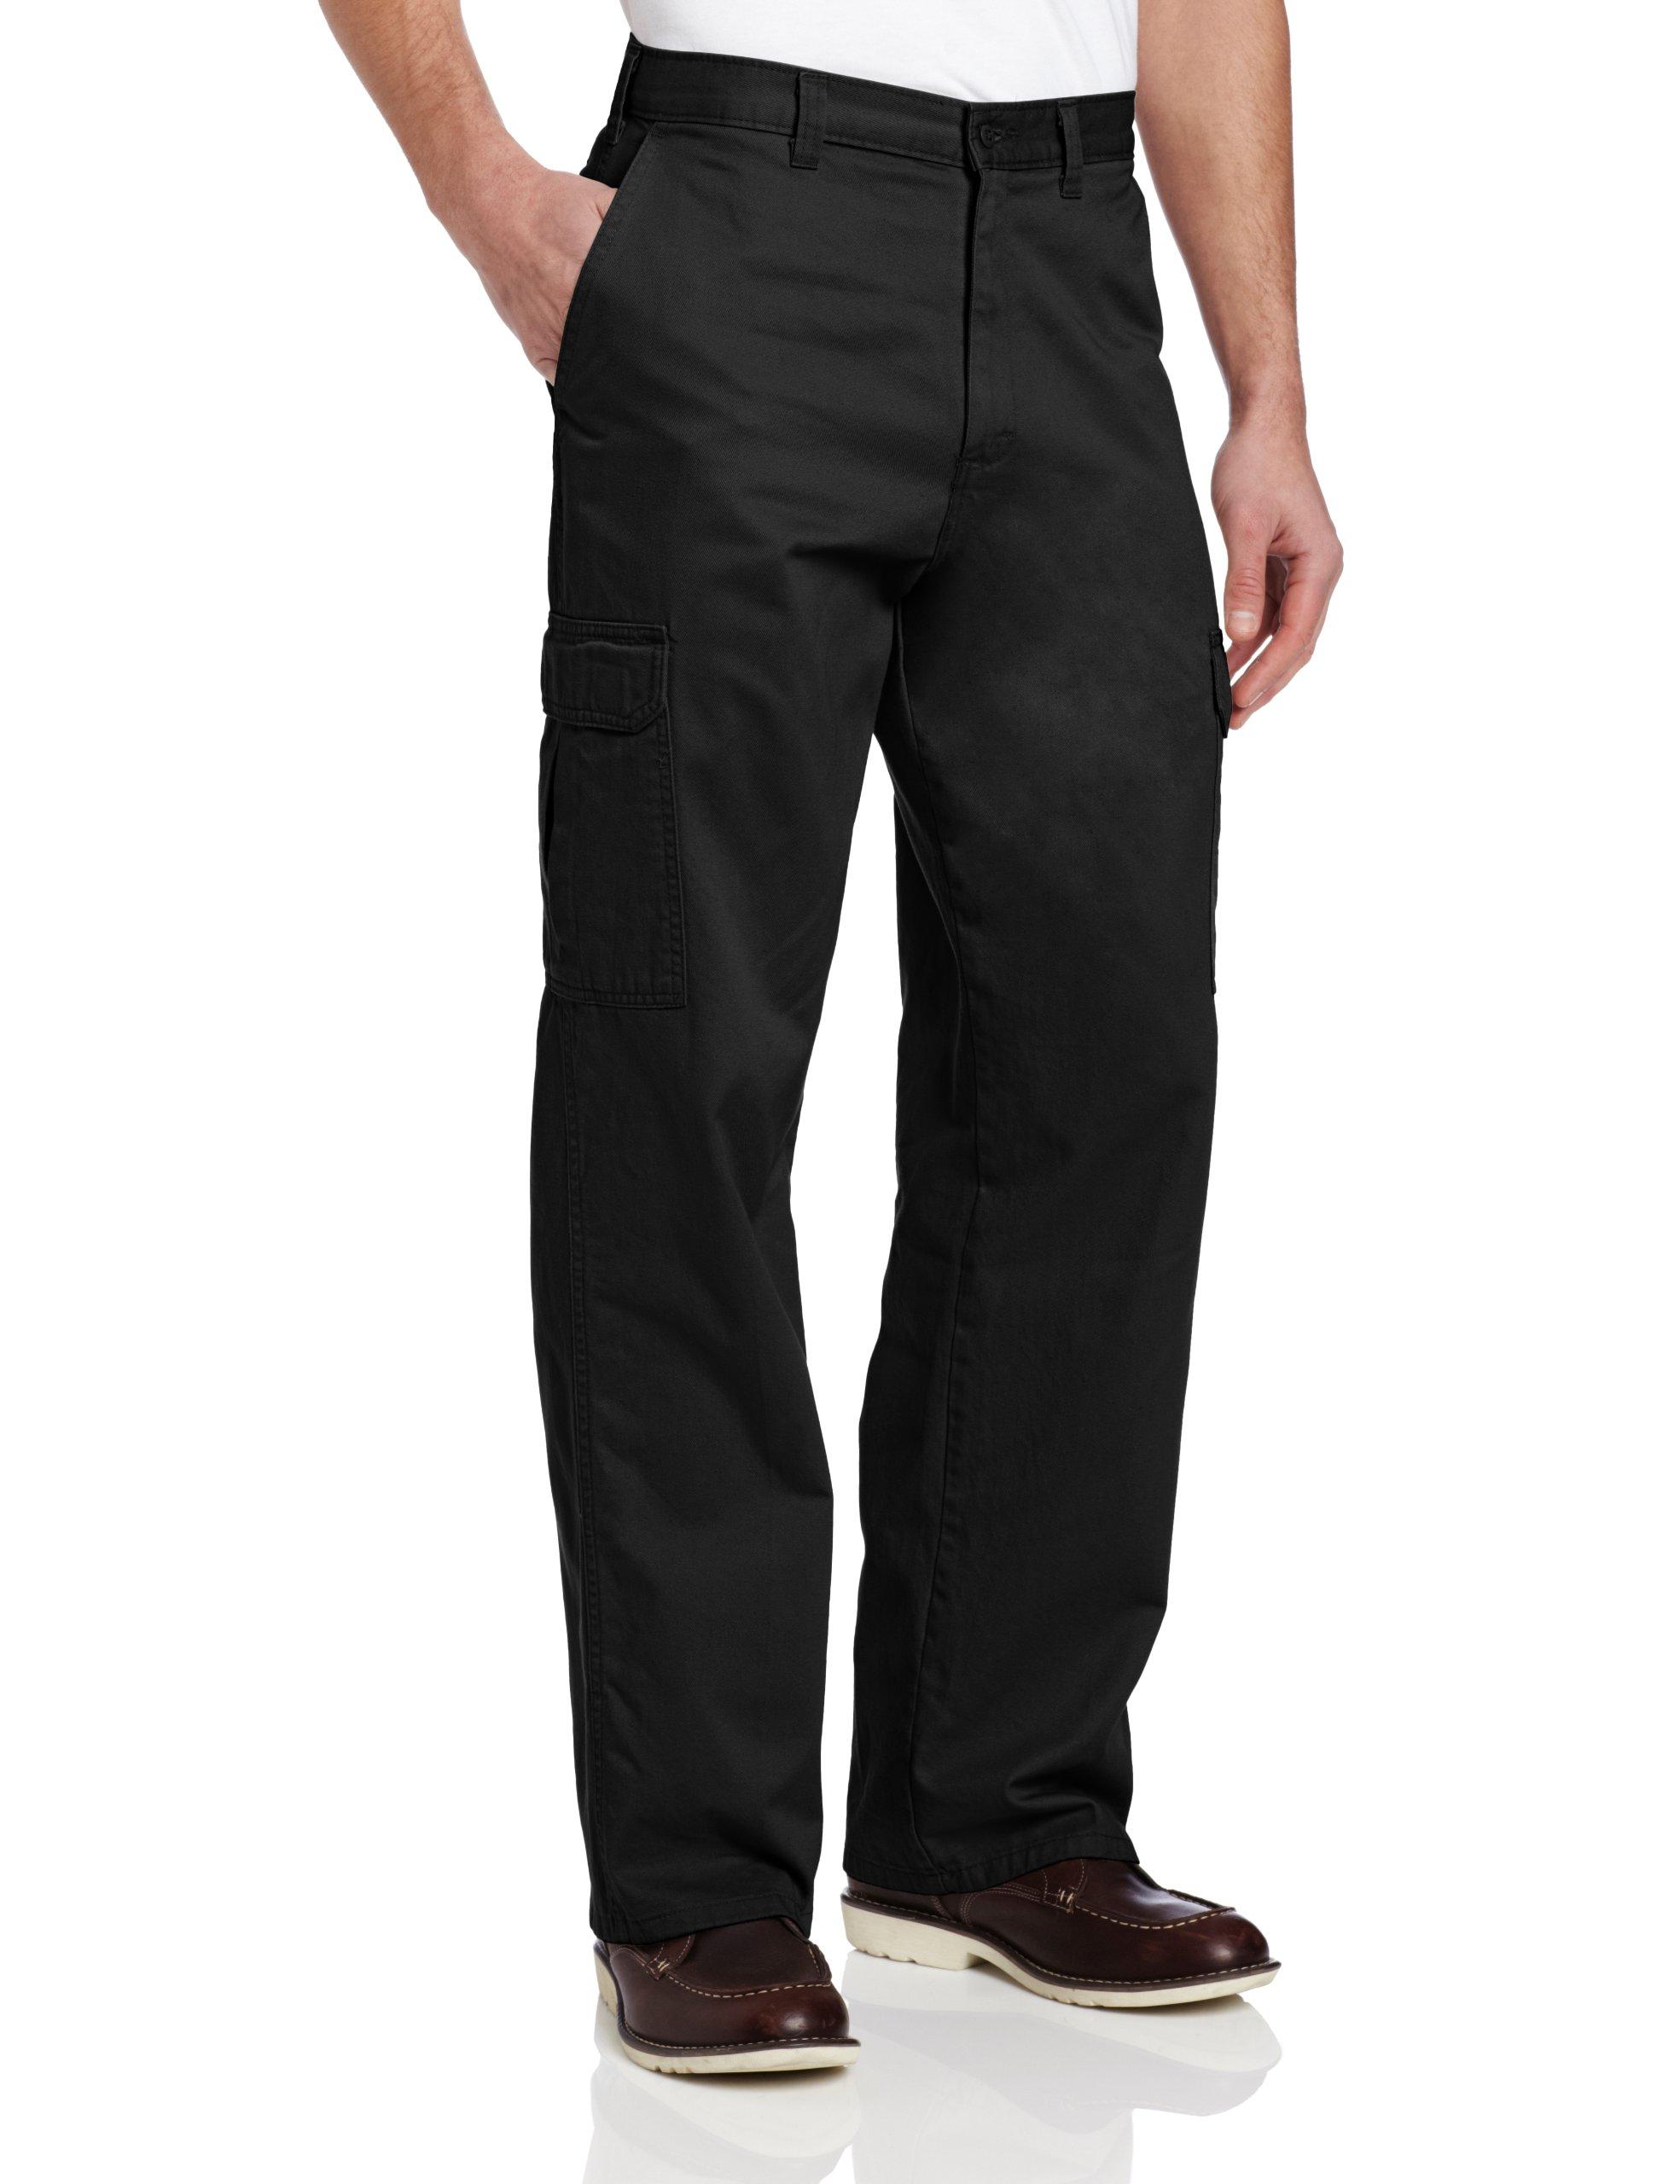 Dickies Men's Loose Fit Cargo Work Pant, Black, 38x32